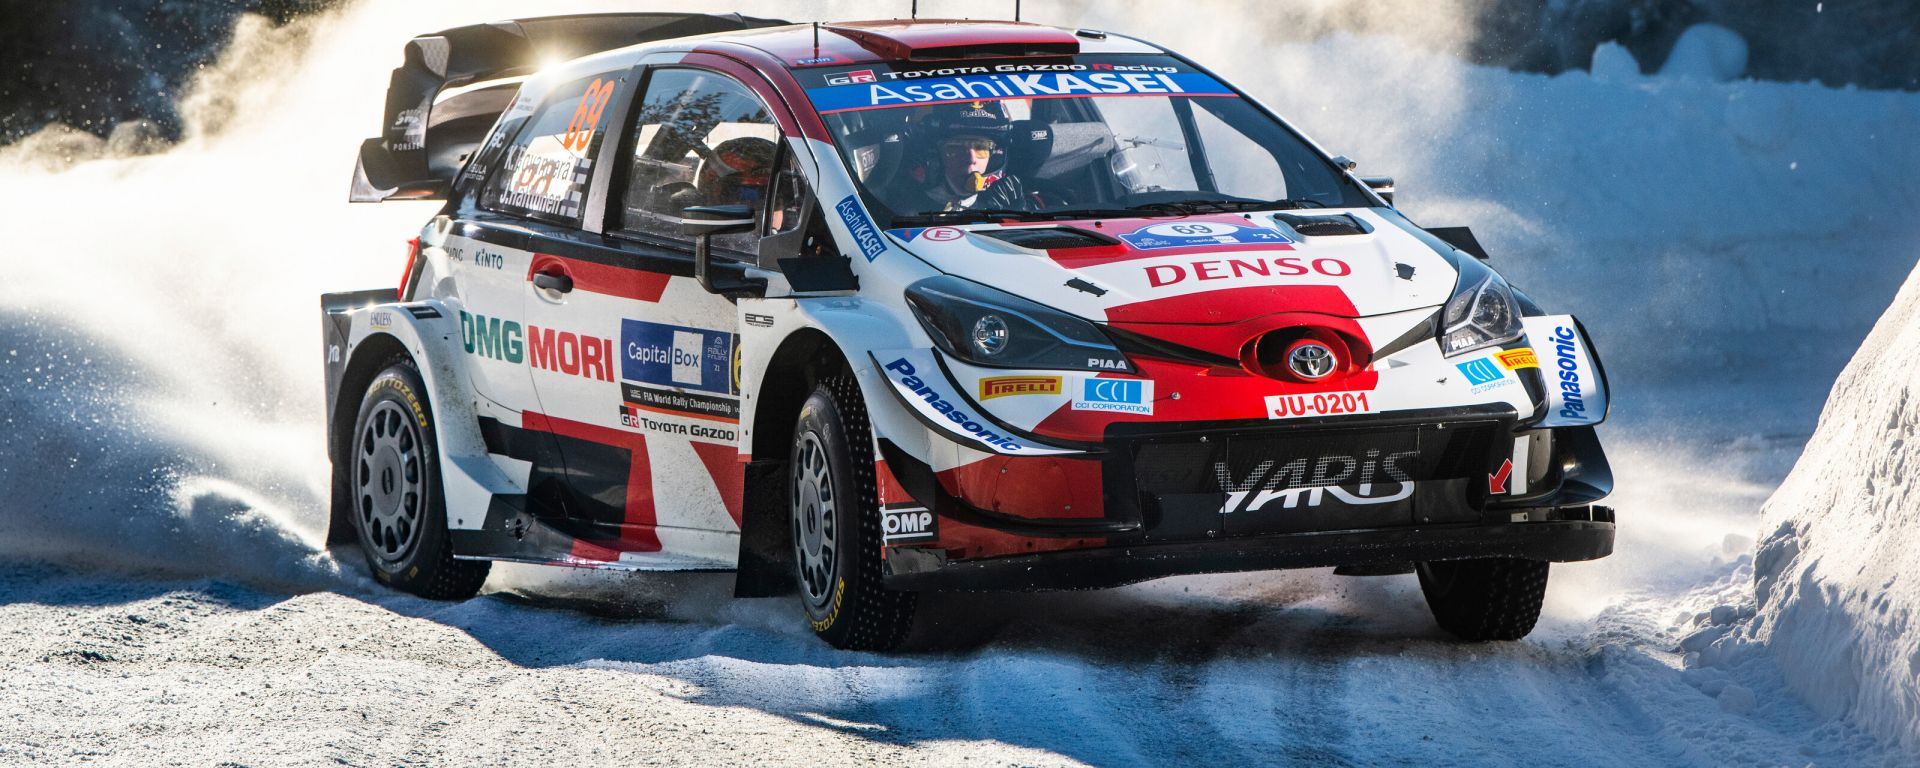 WRC 2021: Kalle Rovampera (Toyota)